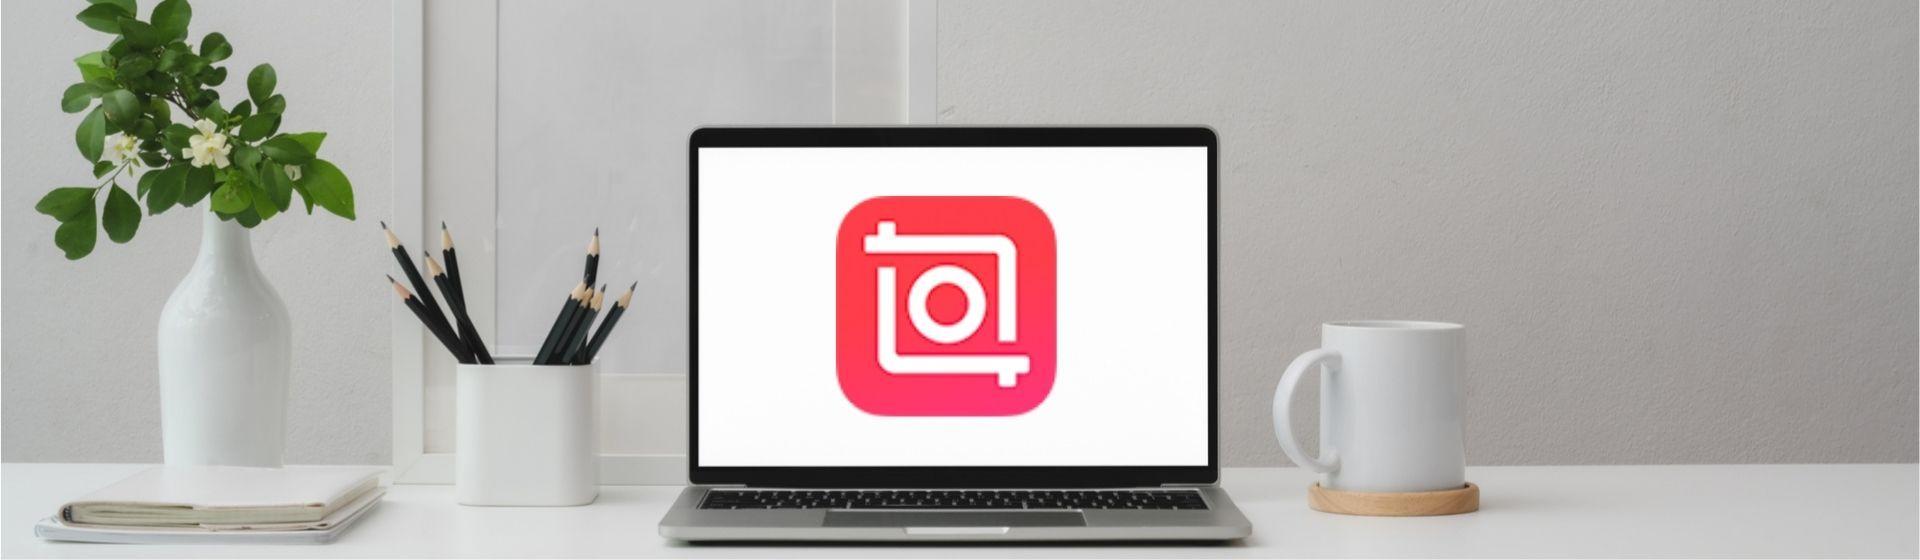 Inshot para PC: como usar o editor de fotos e vídeos no computador